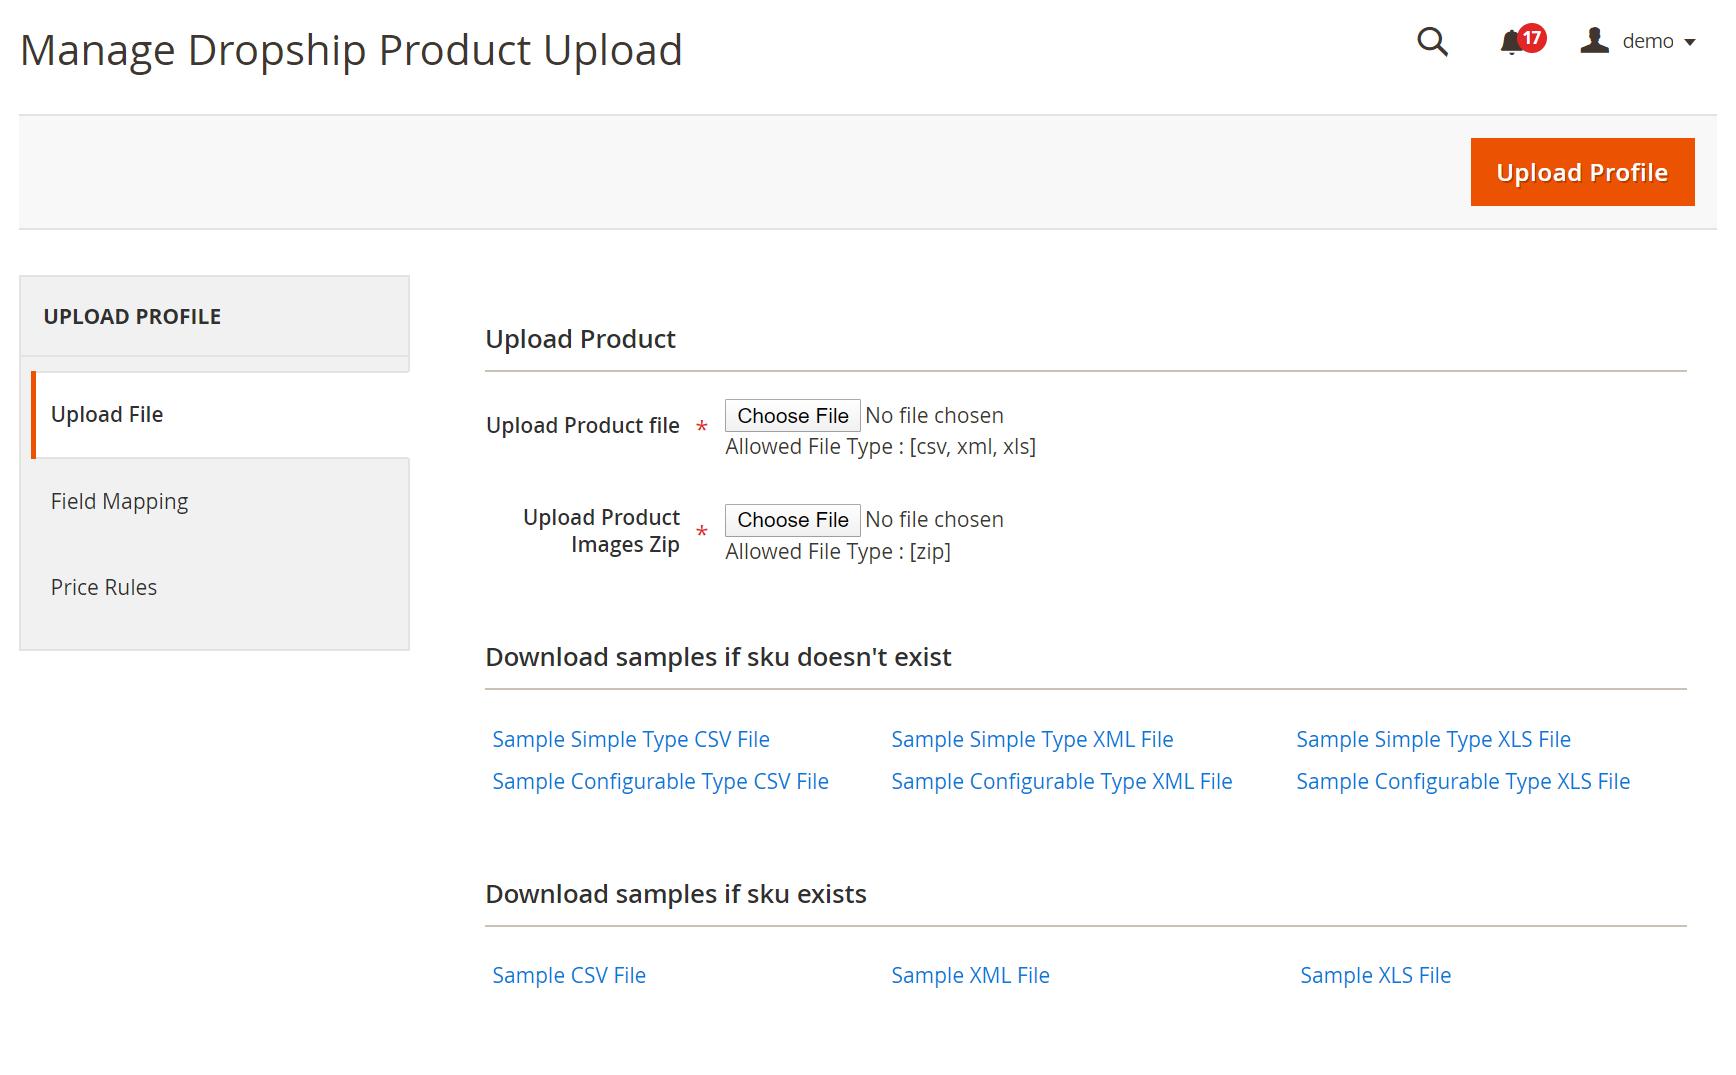 Manage-Dropship-Product-Upload-2